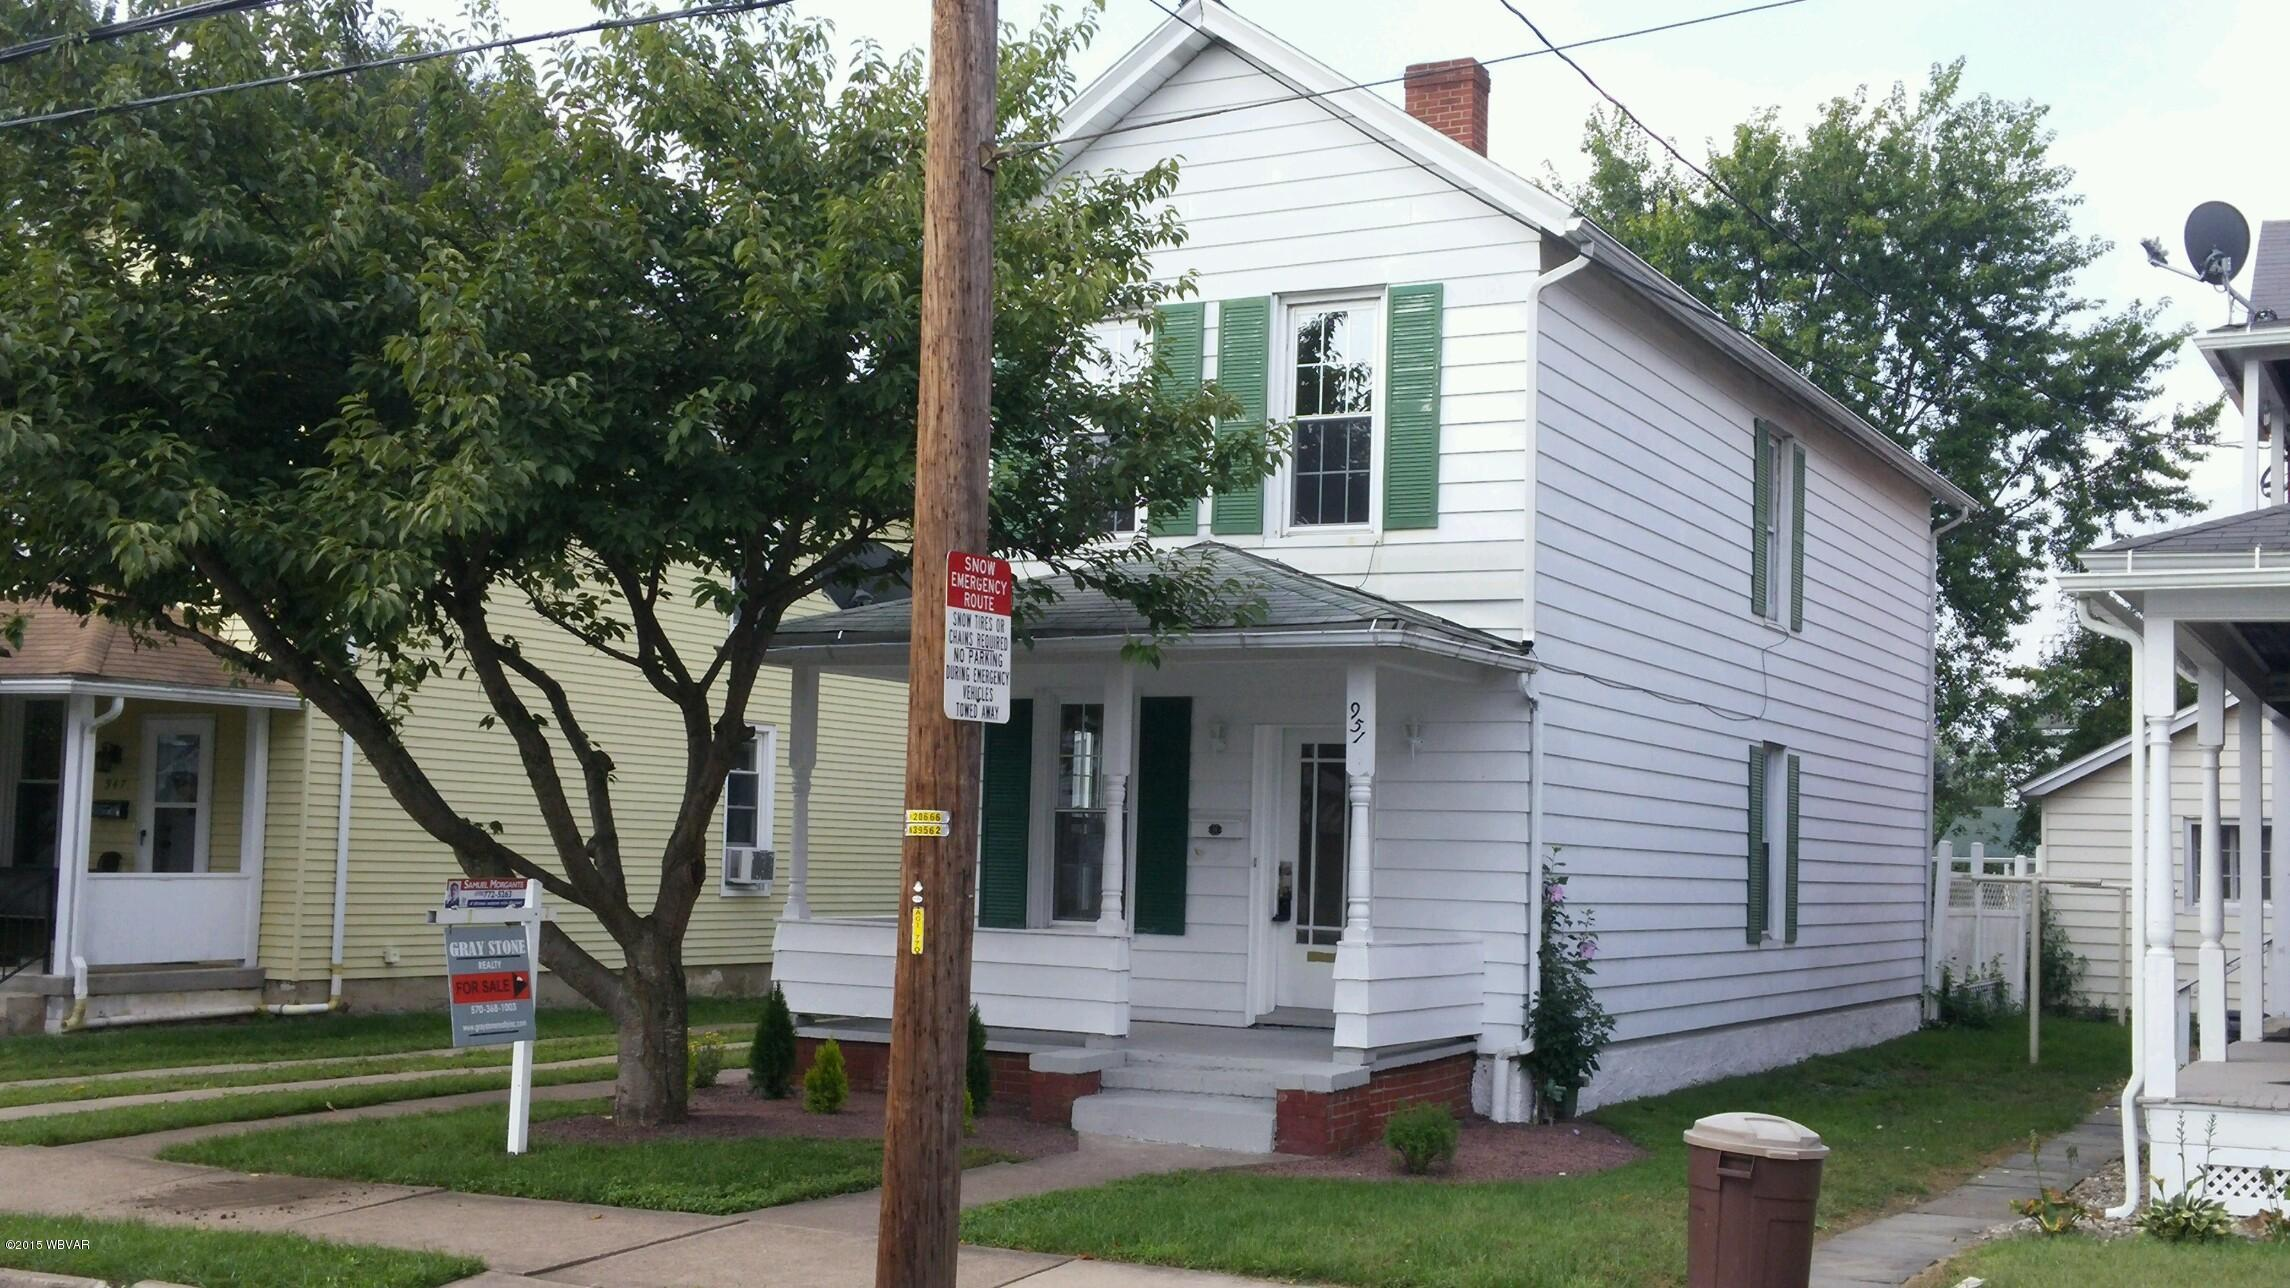 951 FRANKLIN STREET,Williamsport,PA 17701,3 Bedrooms Bedrooms,1 BathroomBathrooms,Residential,FRANKLIN,WB-75338